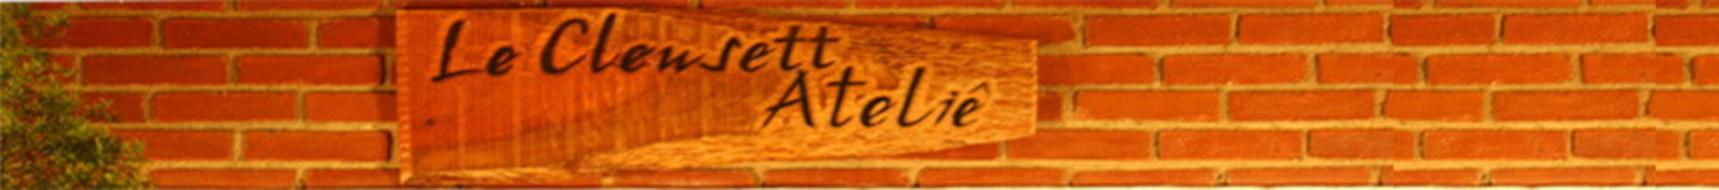 Le Cleusett Ateli�